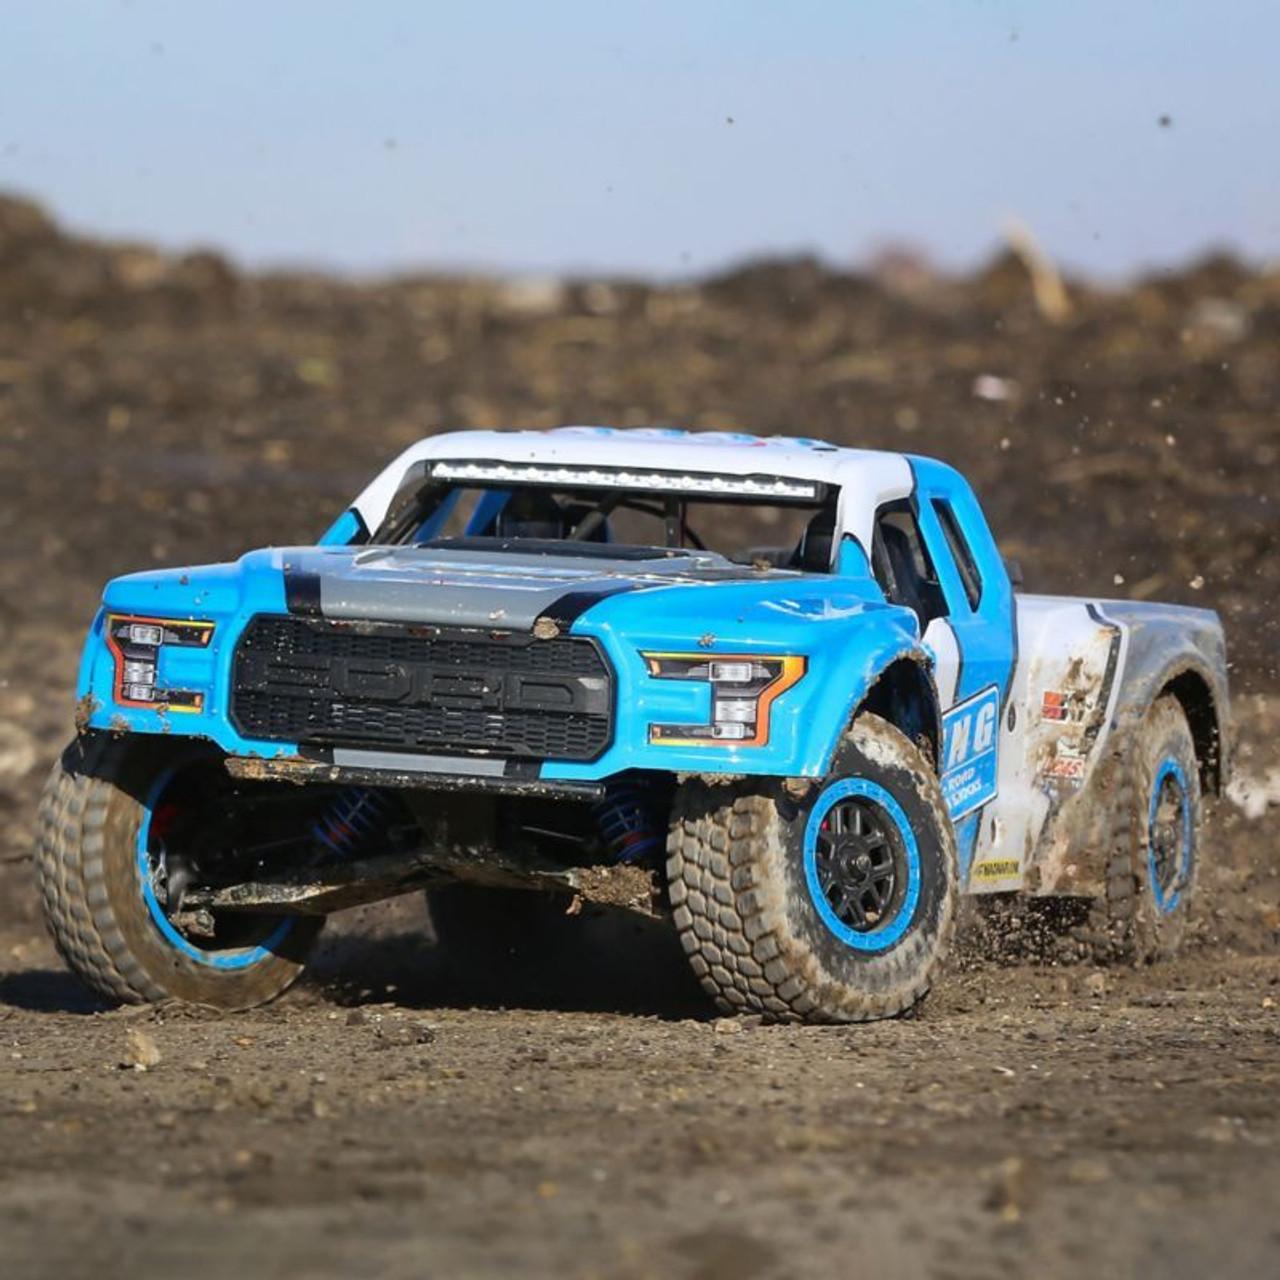 Losi - Ford Raptor Baja Rey